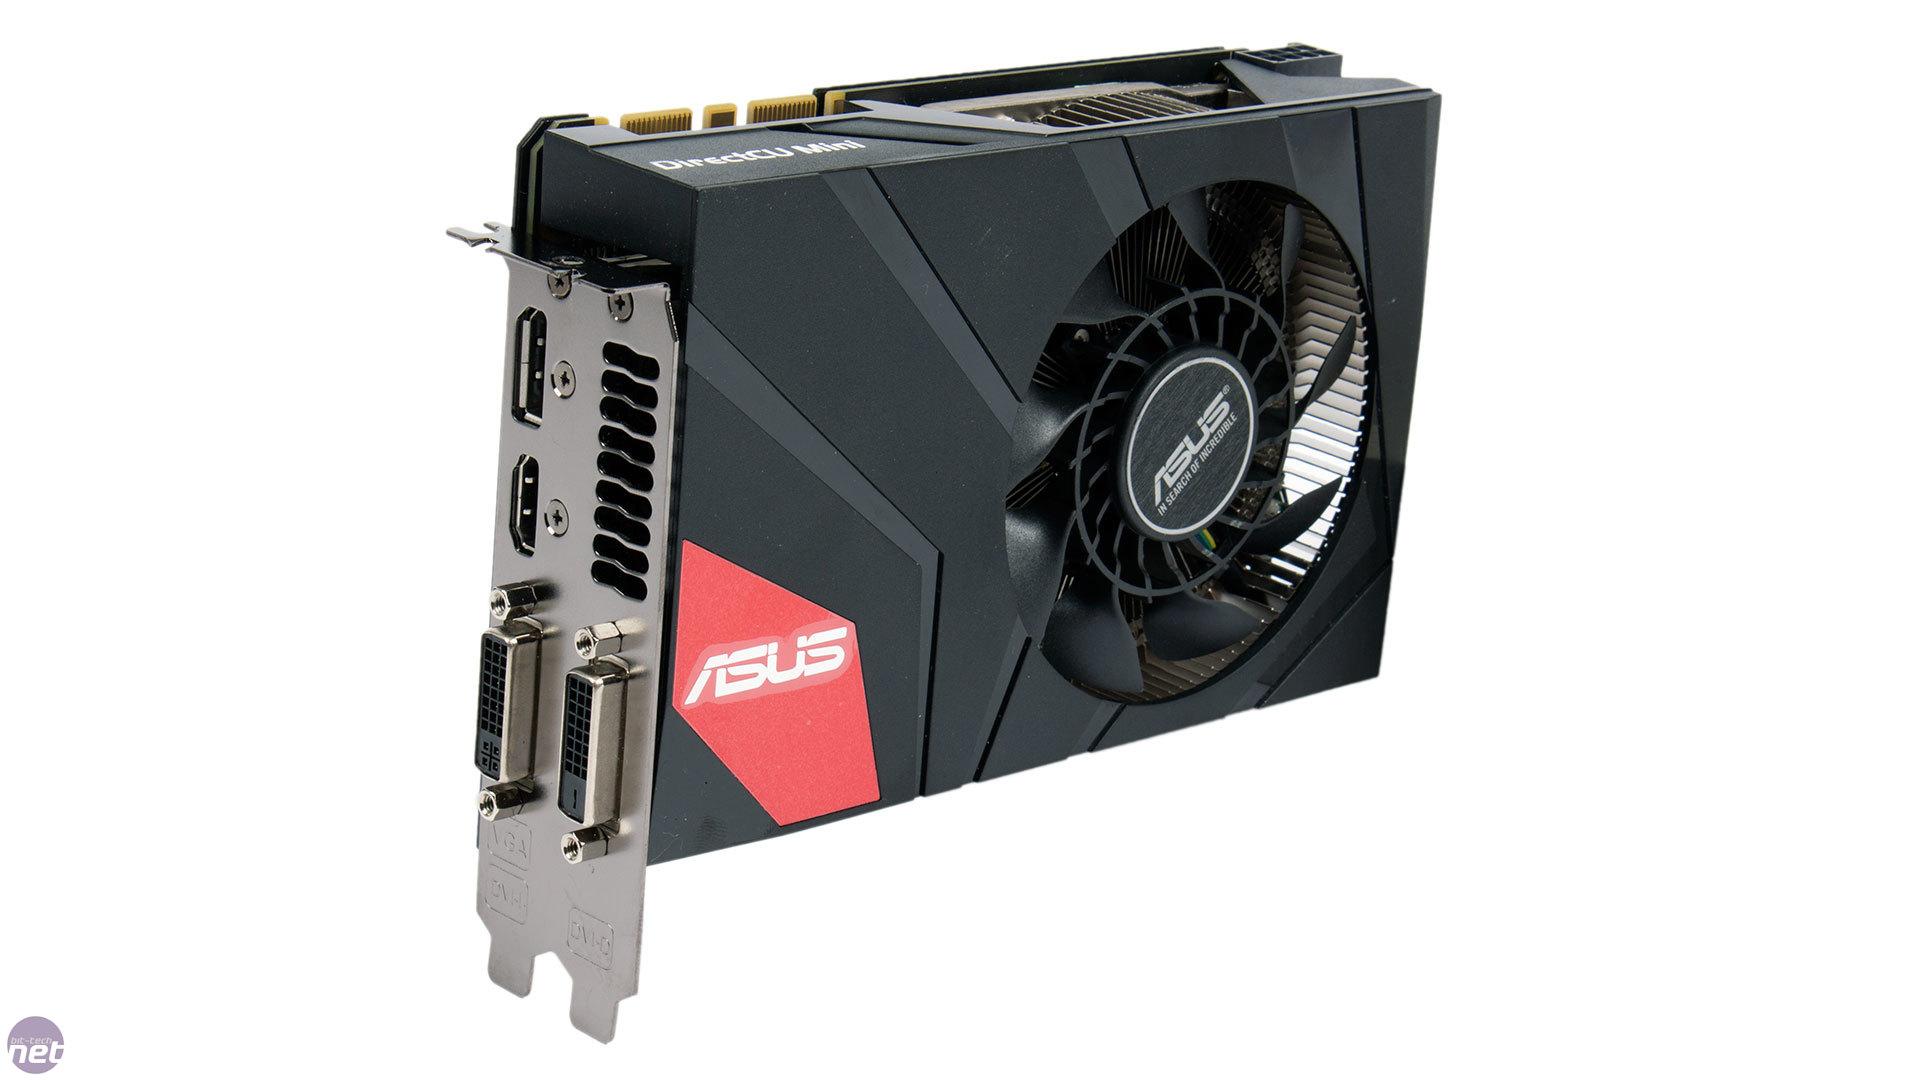 Asus geforce gtx 970 turbo oc 4gb ddr5 - white | ASUS